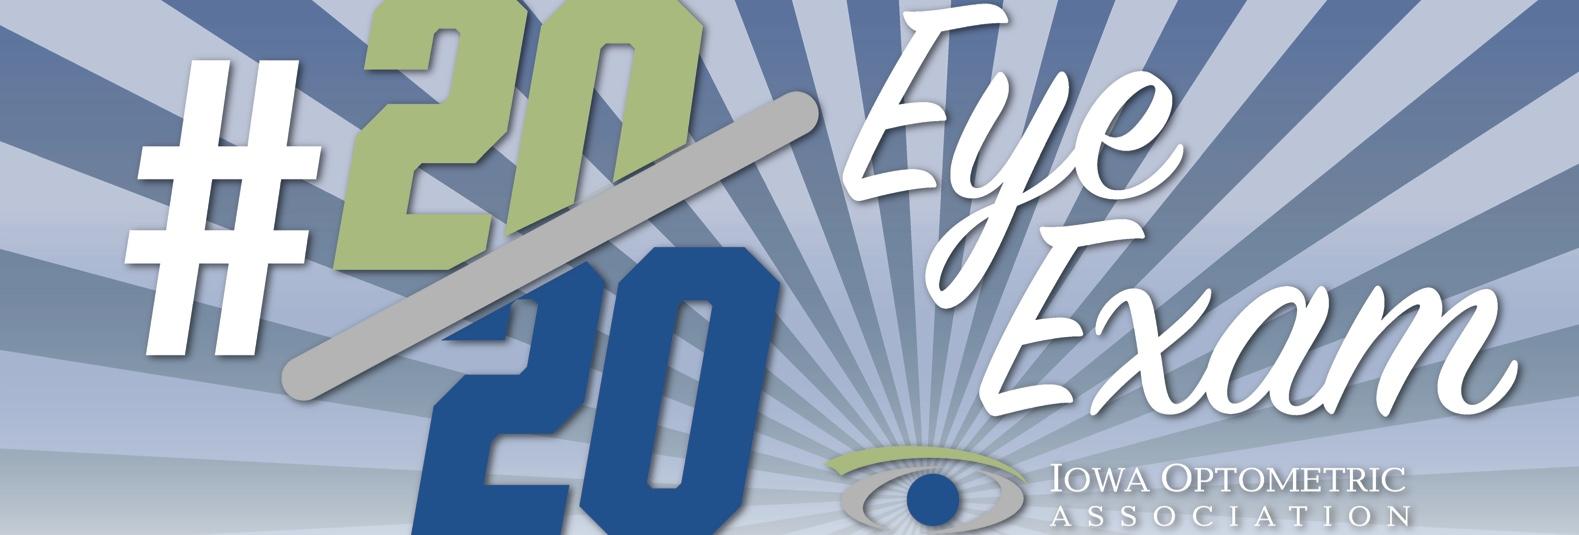 Eyeexam-2020-fin_page_1